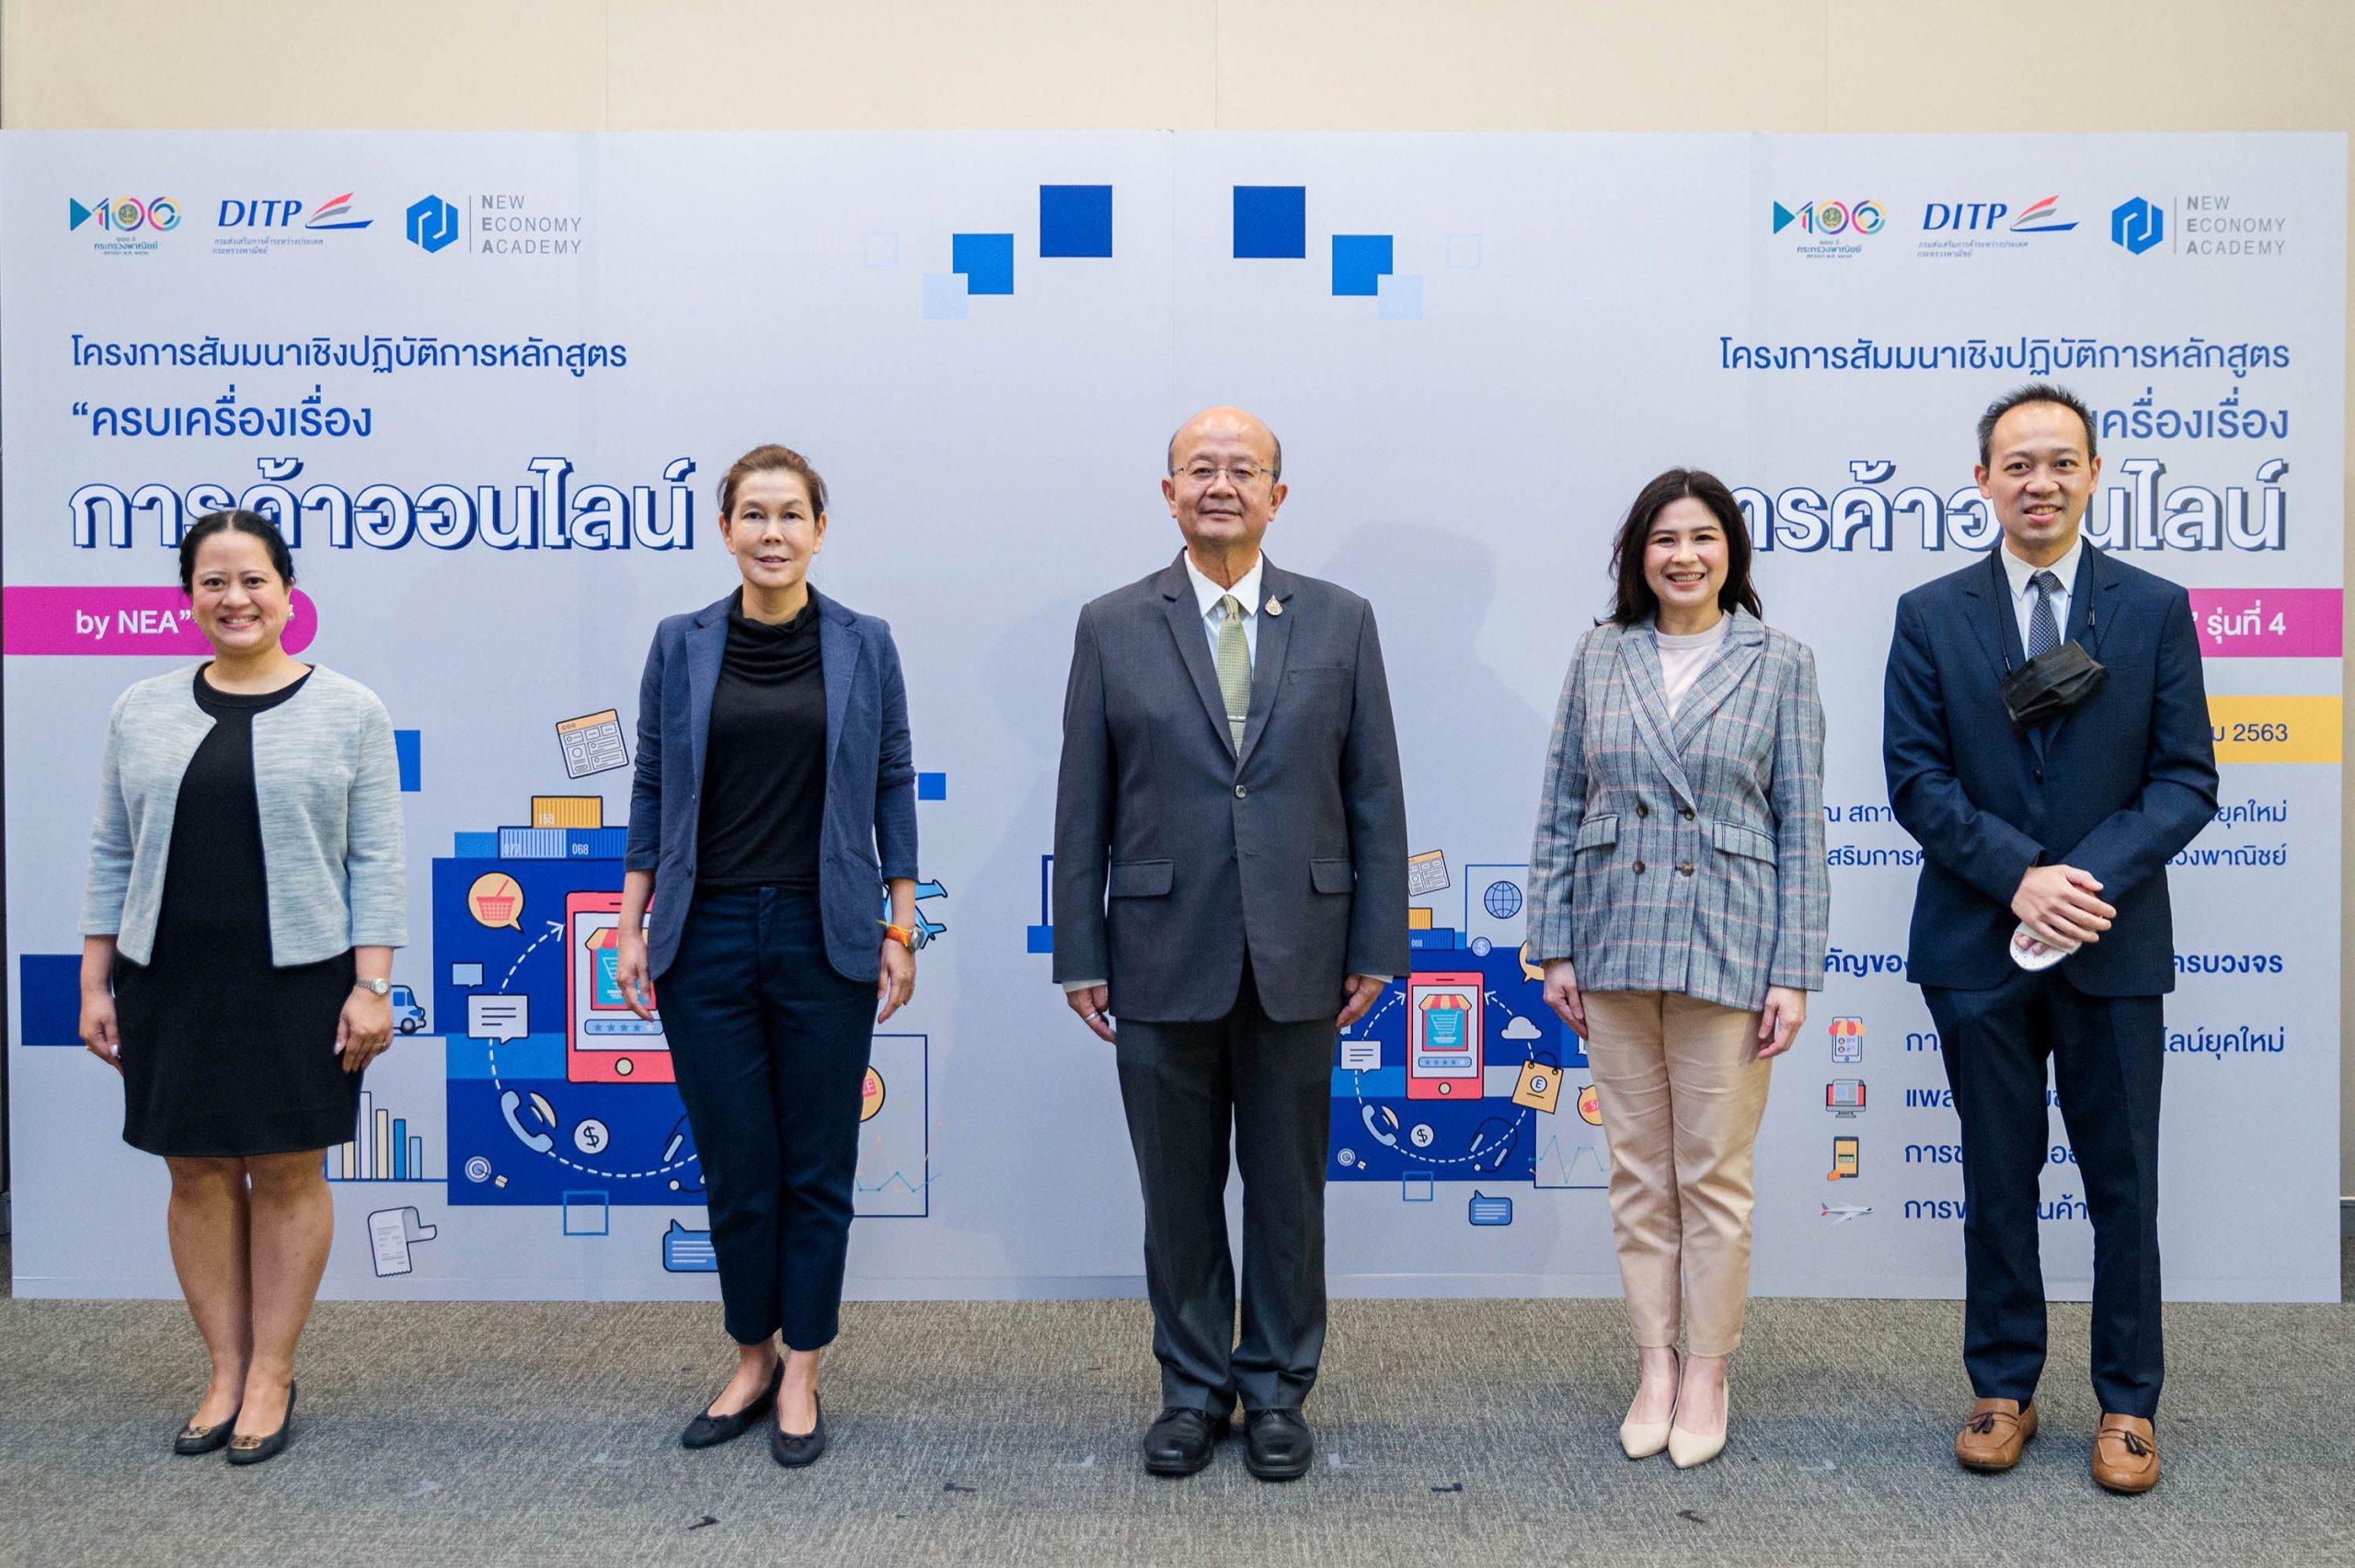 DITP เร่งเสริมทักษะผู้ประกอบการไทยตีตลาดอินเตอร์ พร้อมดึงคนรุ่นใหม่ Gen Z สร้างธุรกิจรองรับยุคดิจิทัลเติบโต